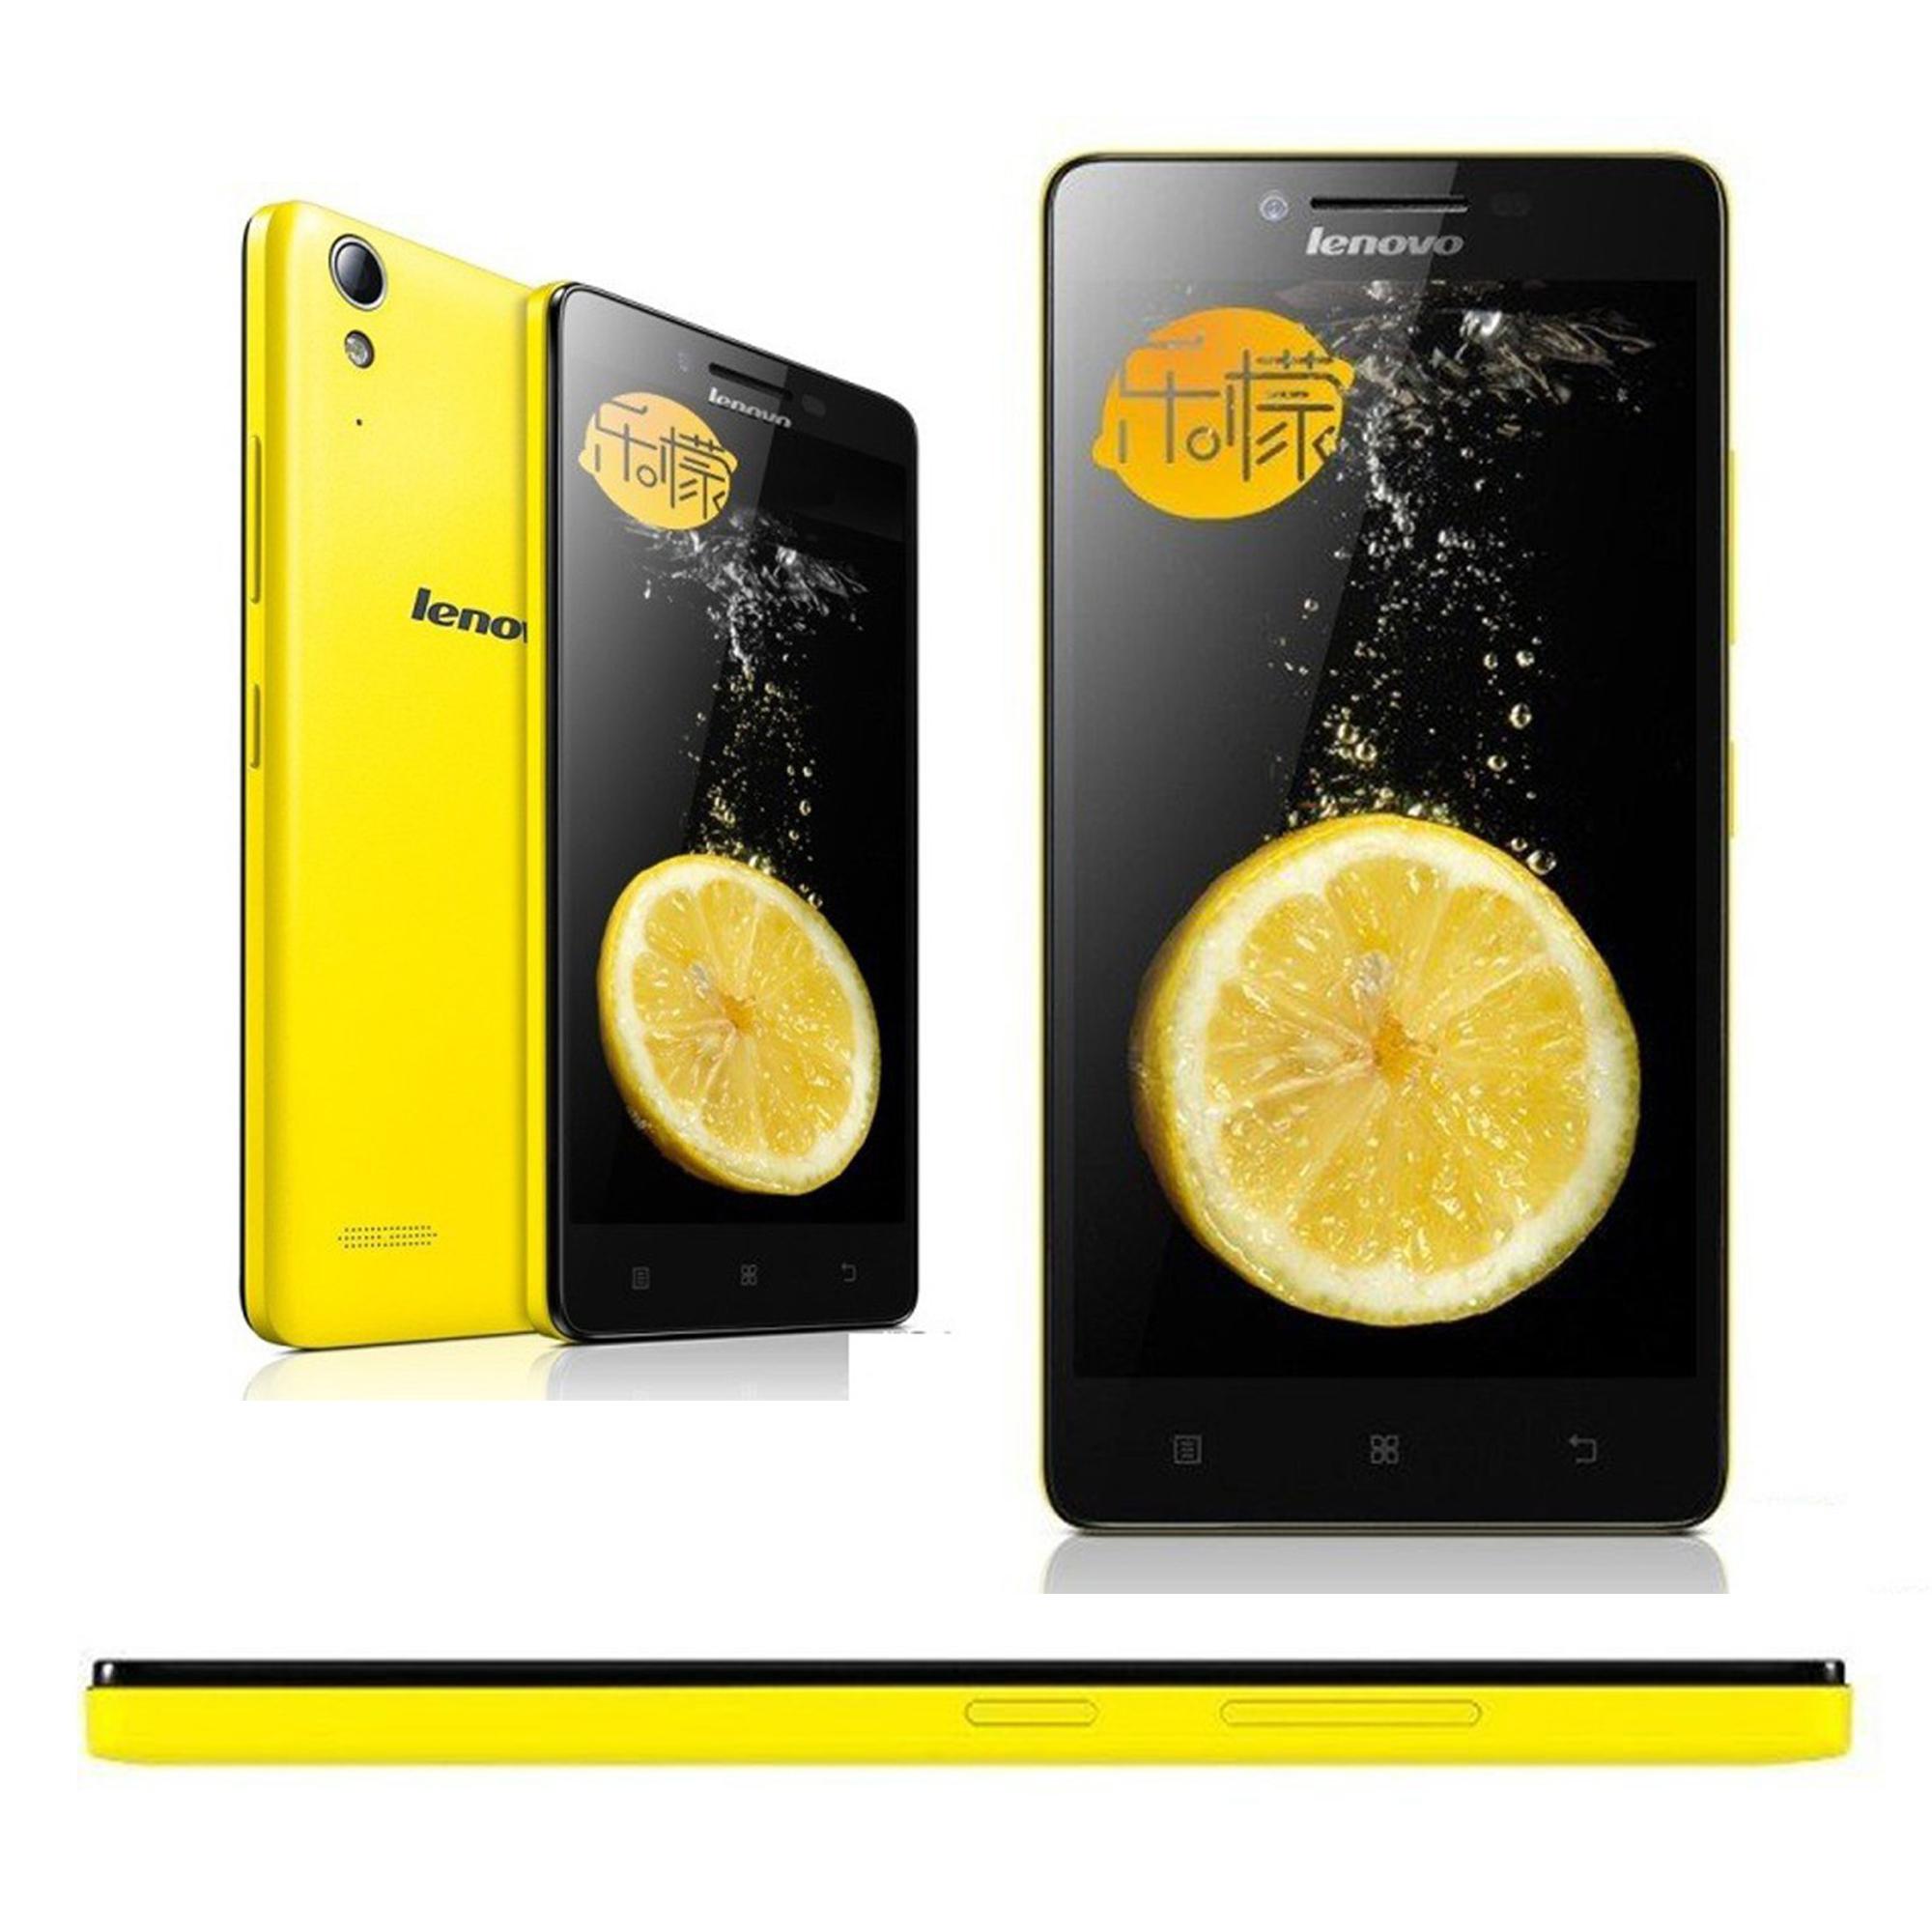 LENOVO K3 NOTE ANDROID 6.0 OCTA CORE FDD LTE 4G RAM 2G CAMERA 13MP Lemon